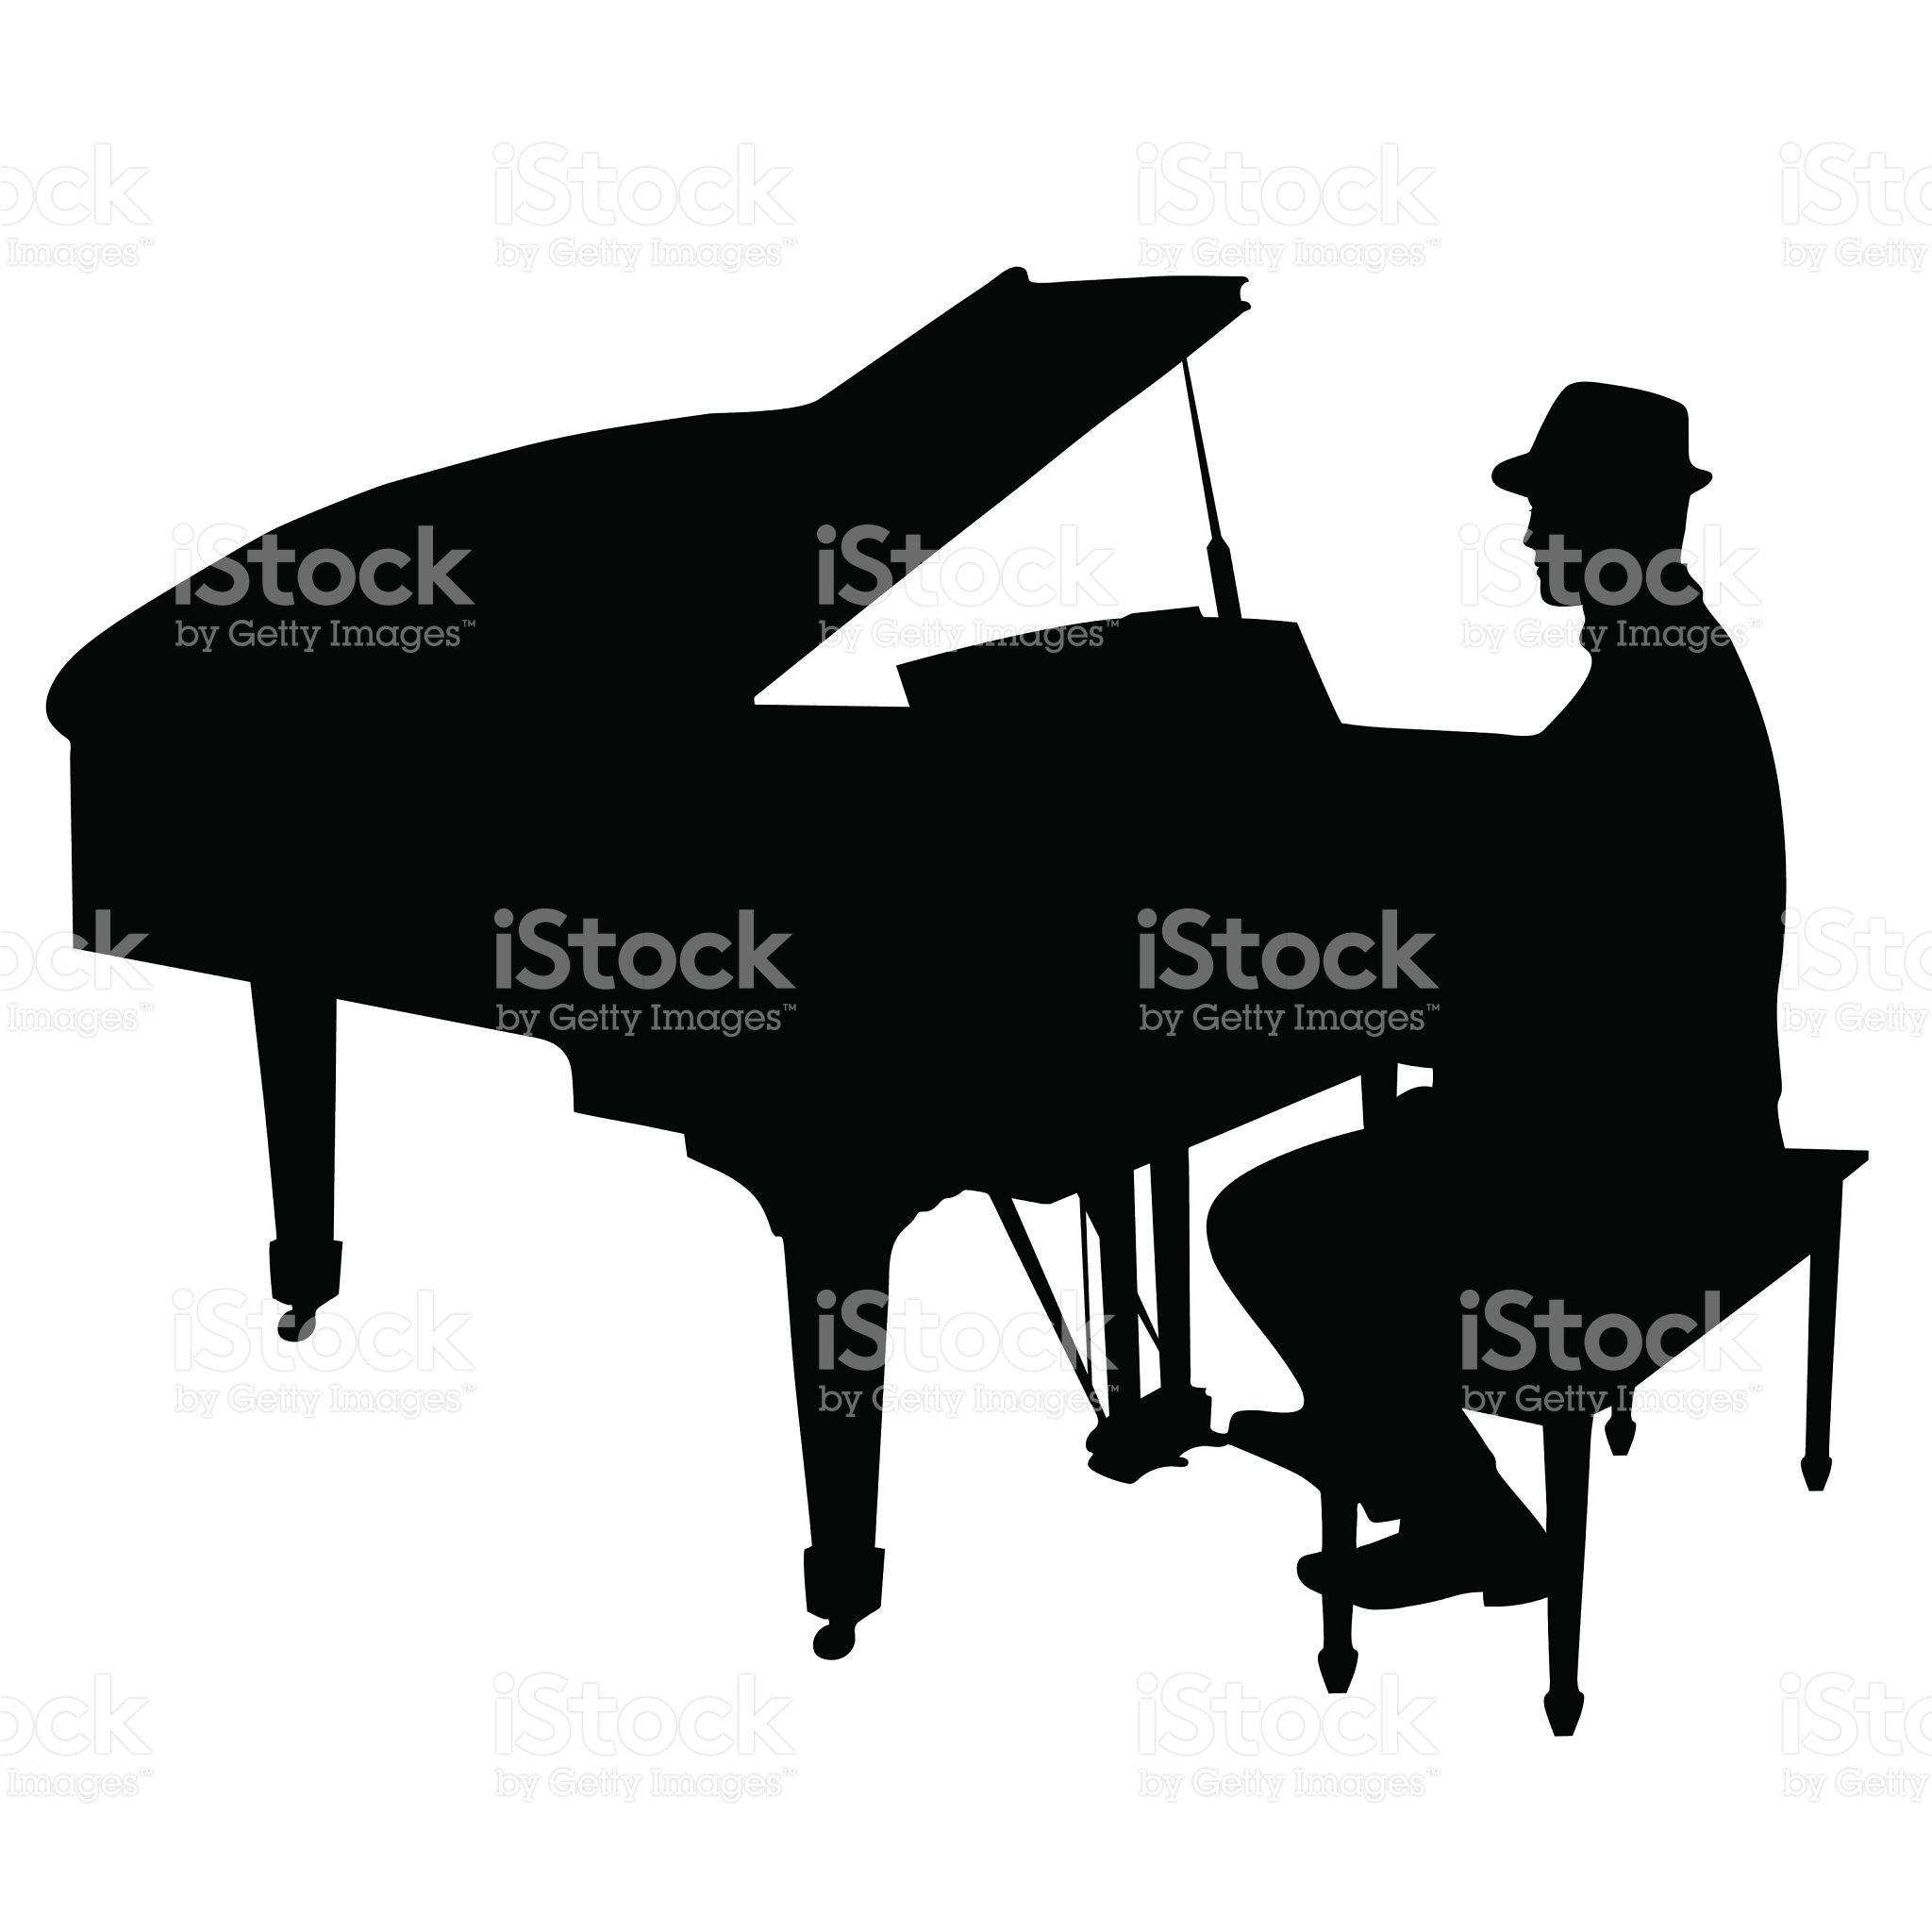 2048x2048 A Black Silhouette Of A Man Sitting